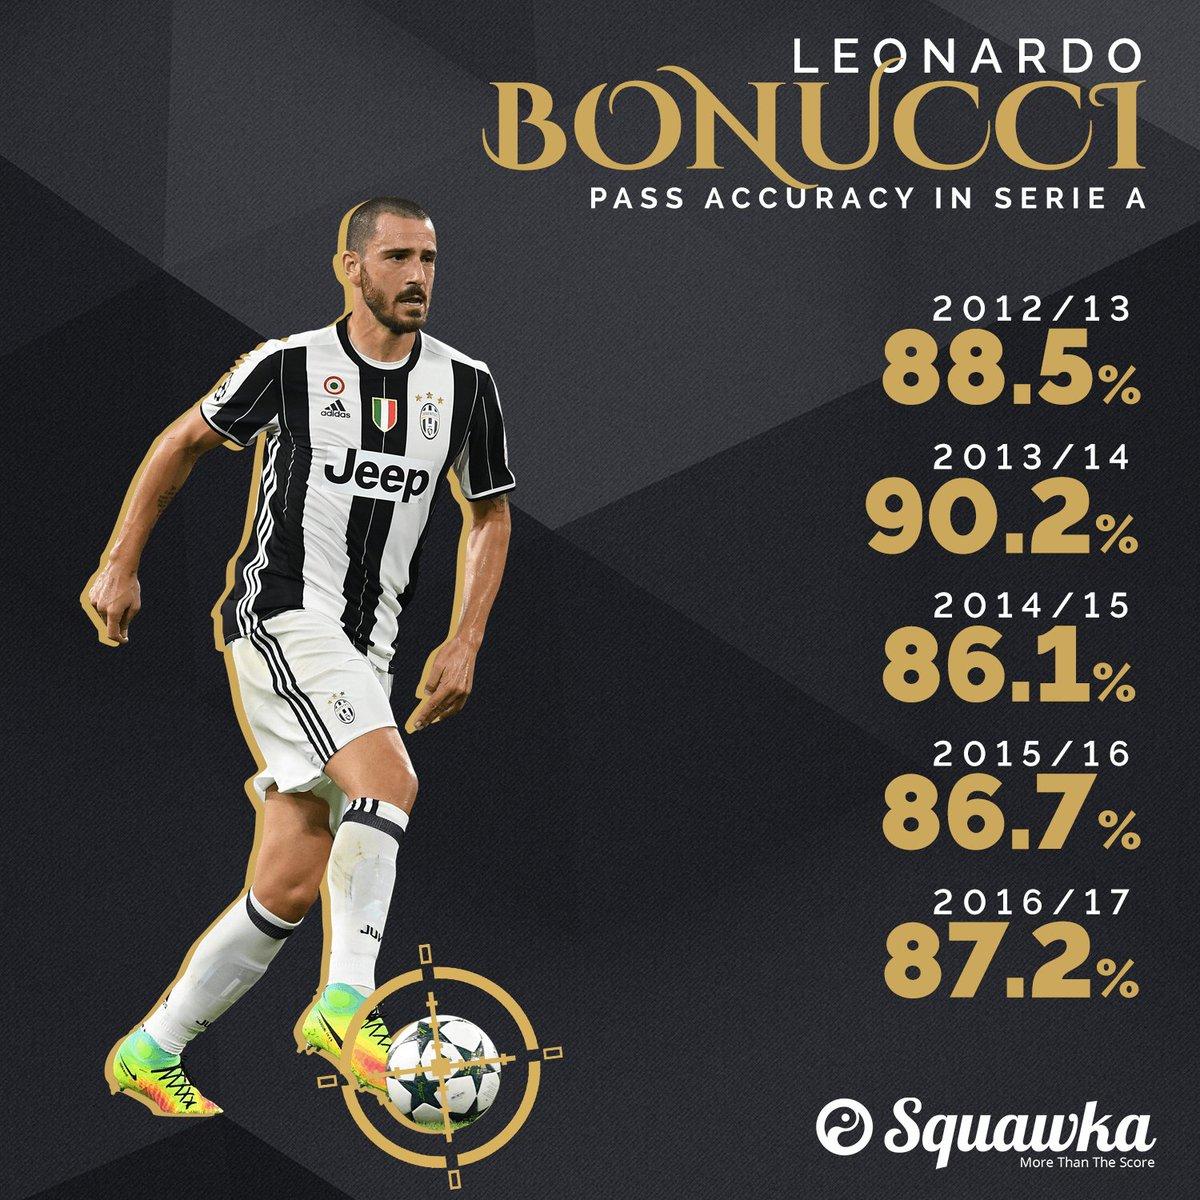 Statistik Leonardi Bonucci